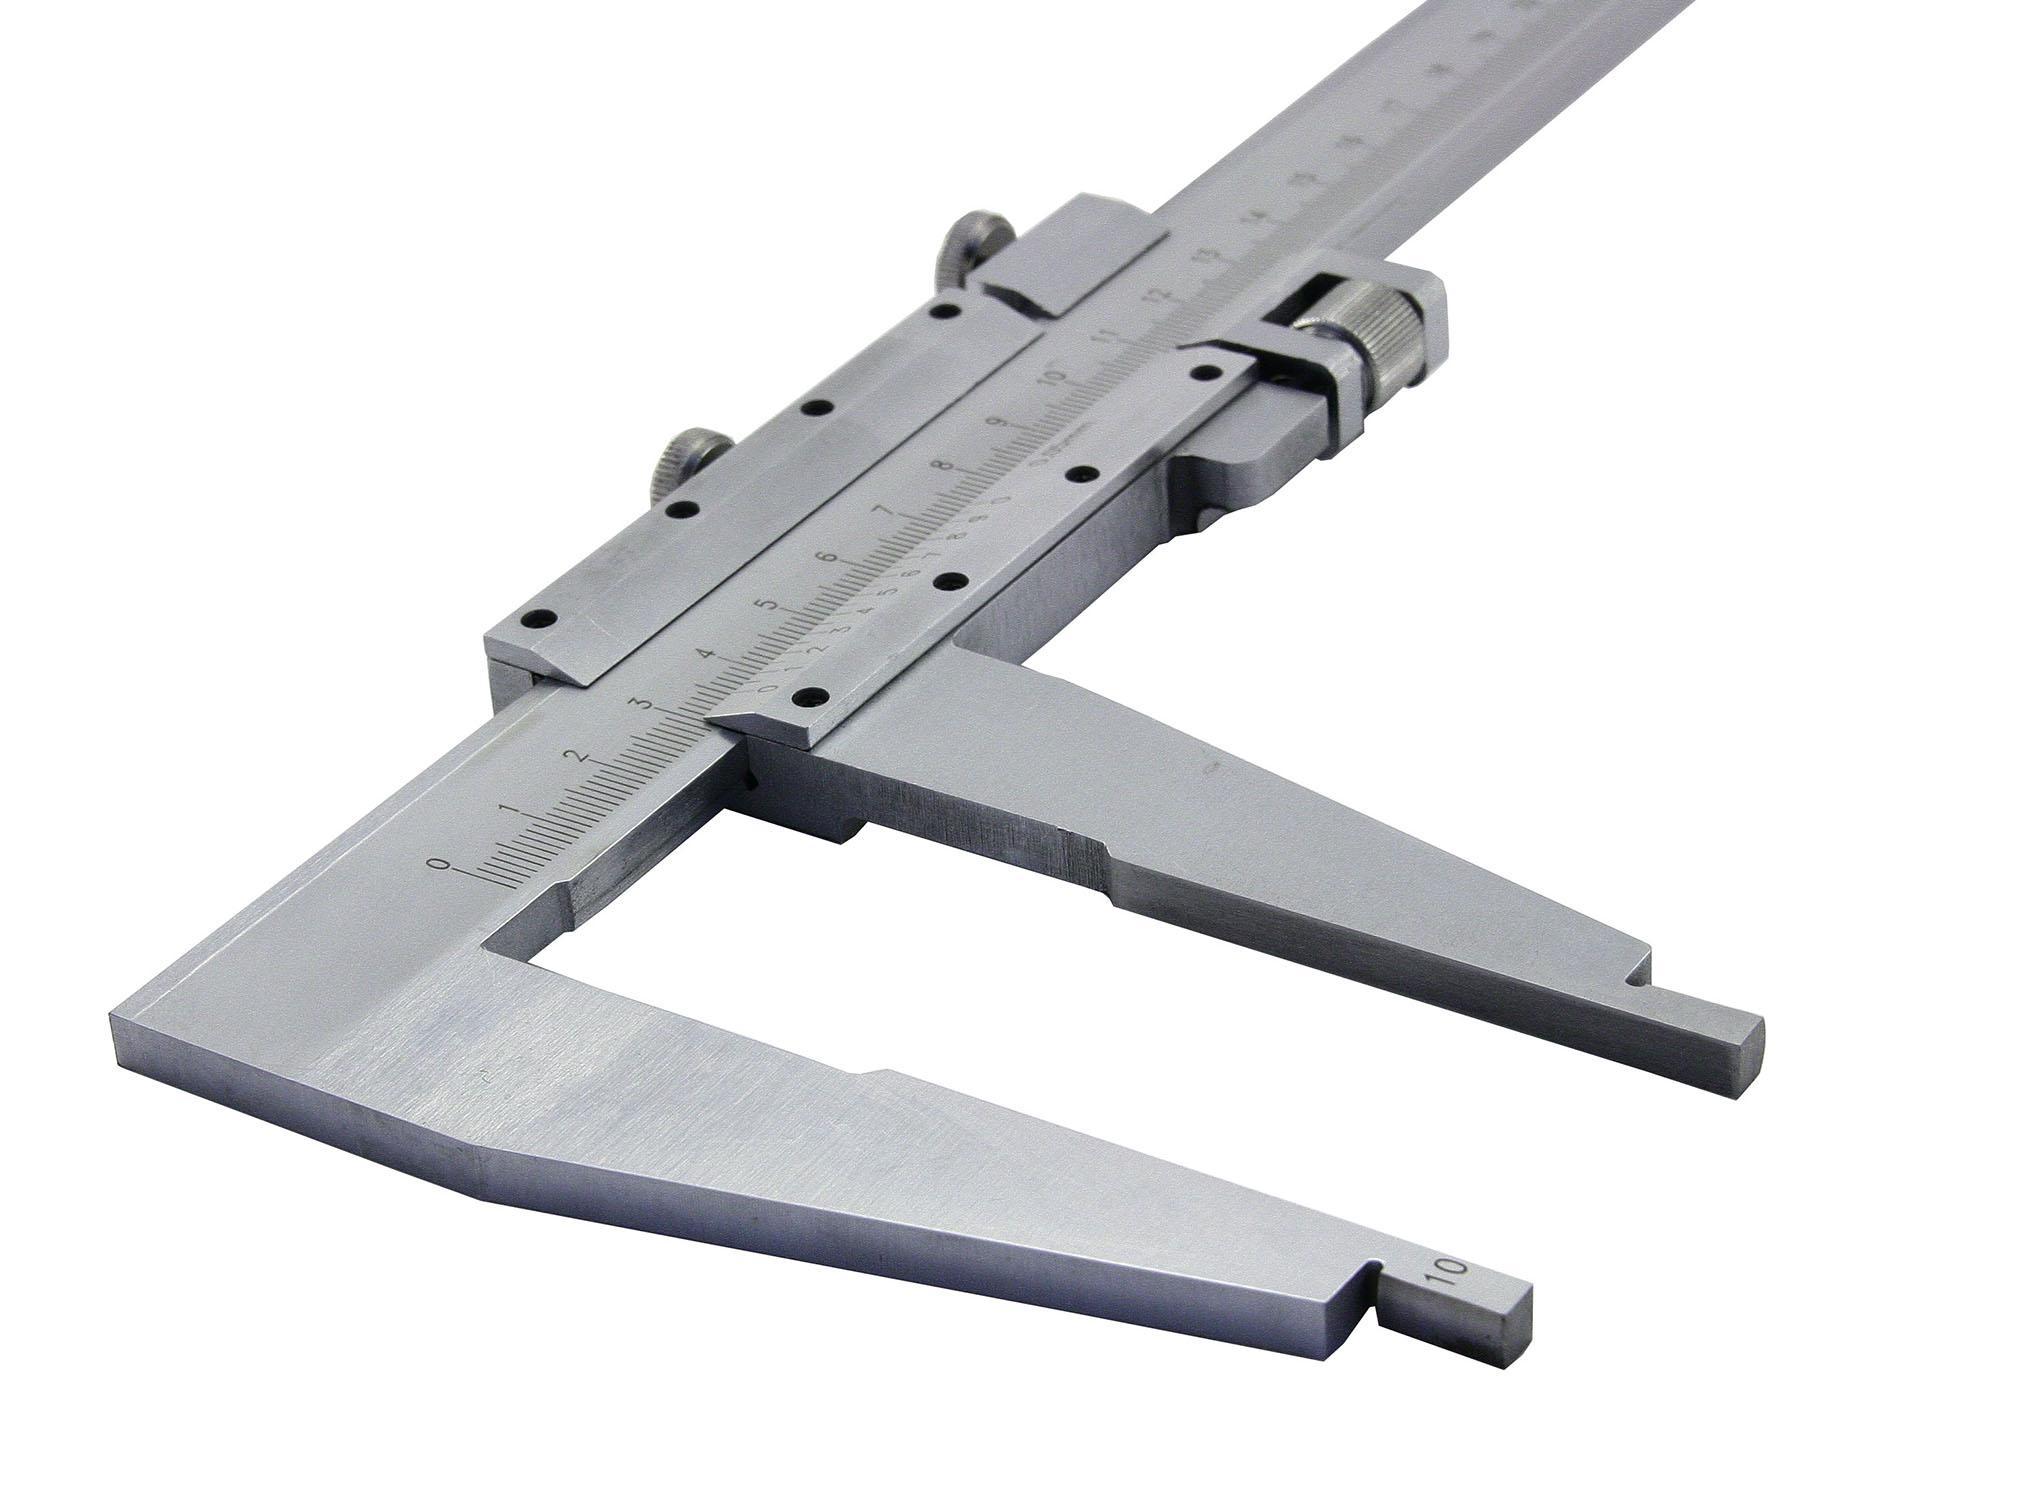 Штангенциркуль КАЛИБРОН ШЦ-iii 0-400 губ 100мм 0.1 линейка калиброн 1000х35х0 8mm 73857